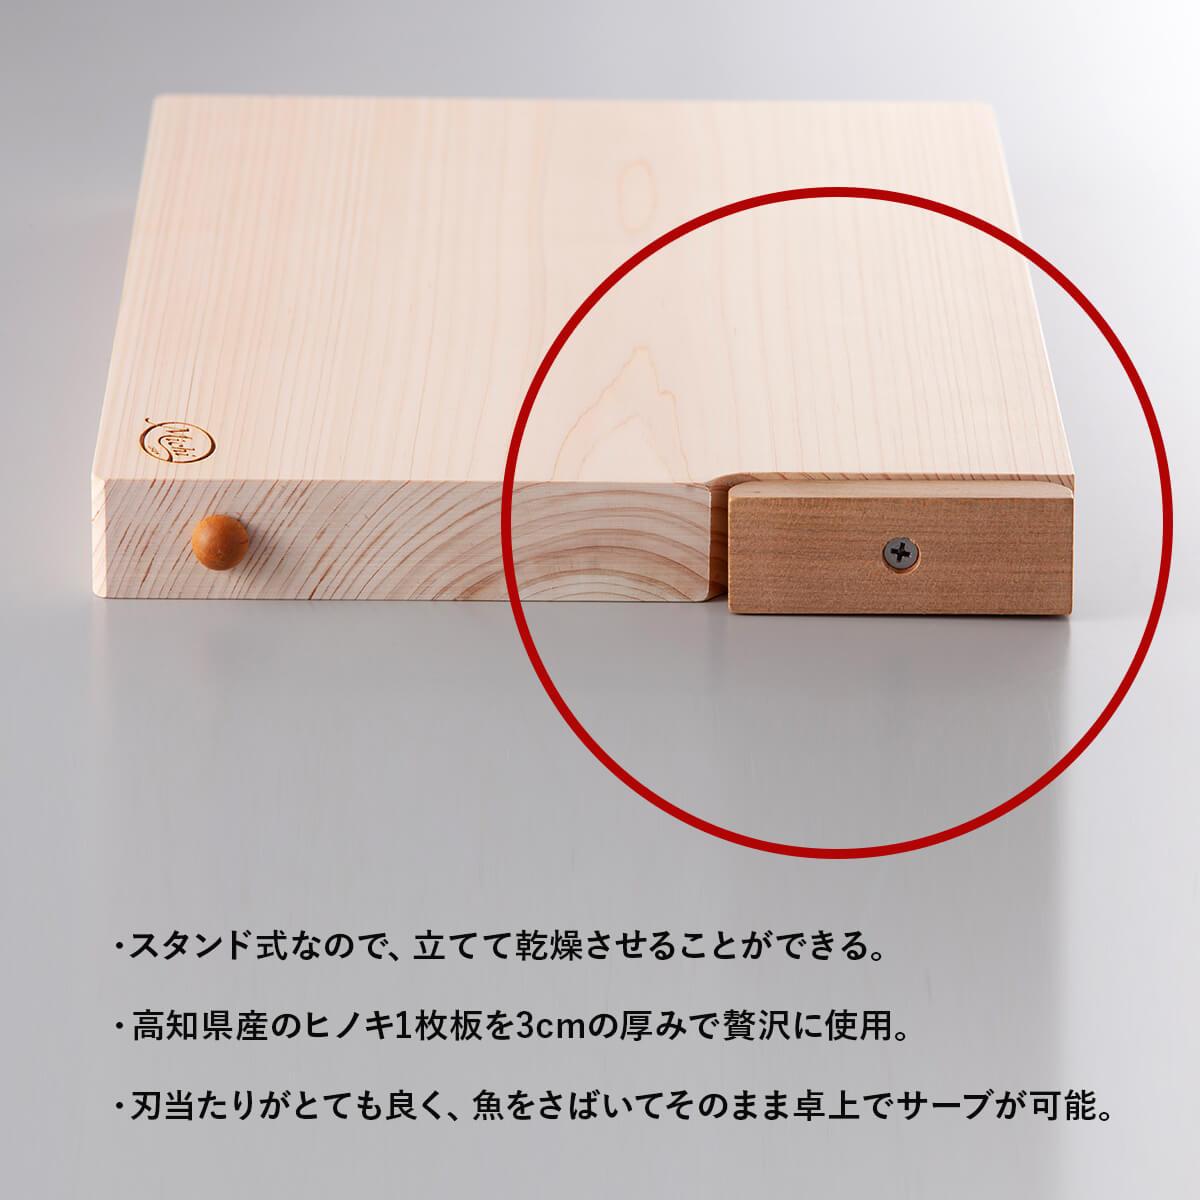 Michi カッティングボード for Fish M | Michi